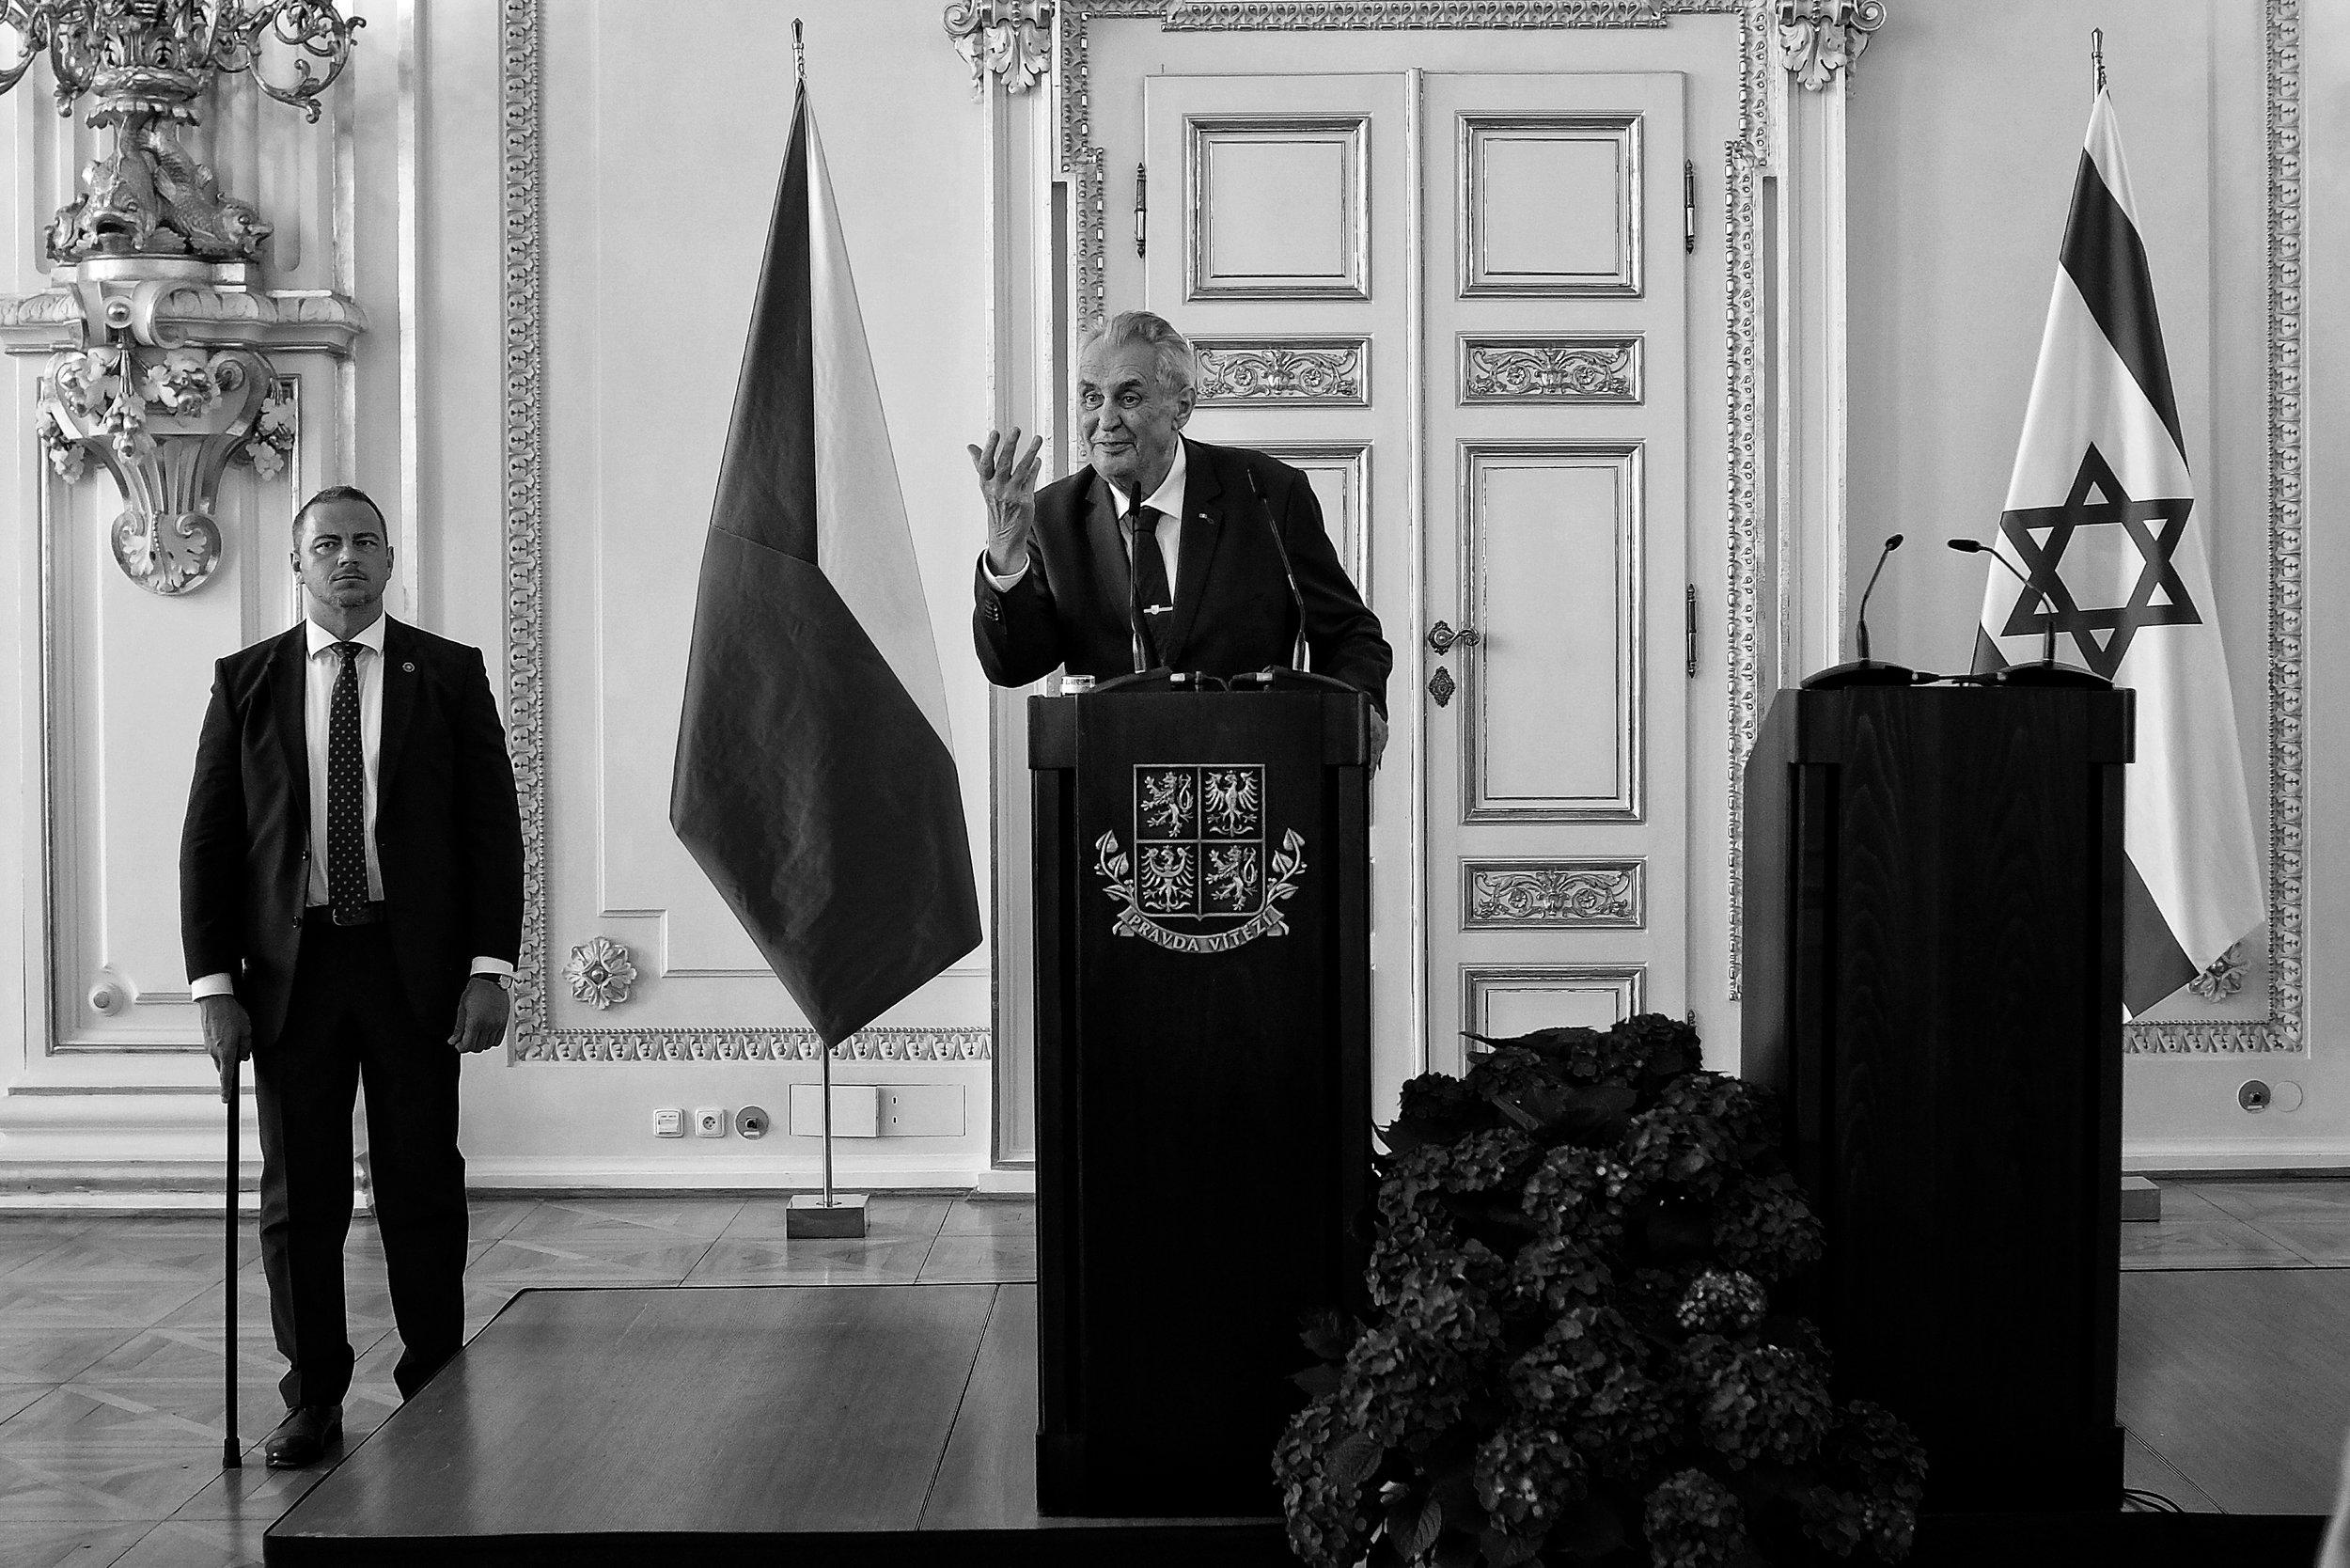 Czech president Miloš Zeman hosted Israel's 70th Independence Day celebration at the Spanish Hall of Prague Castle, 25.4.2018.